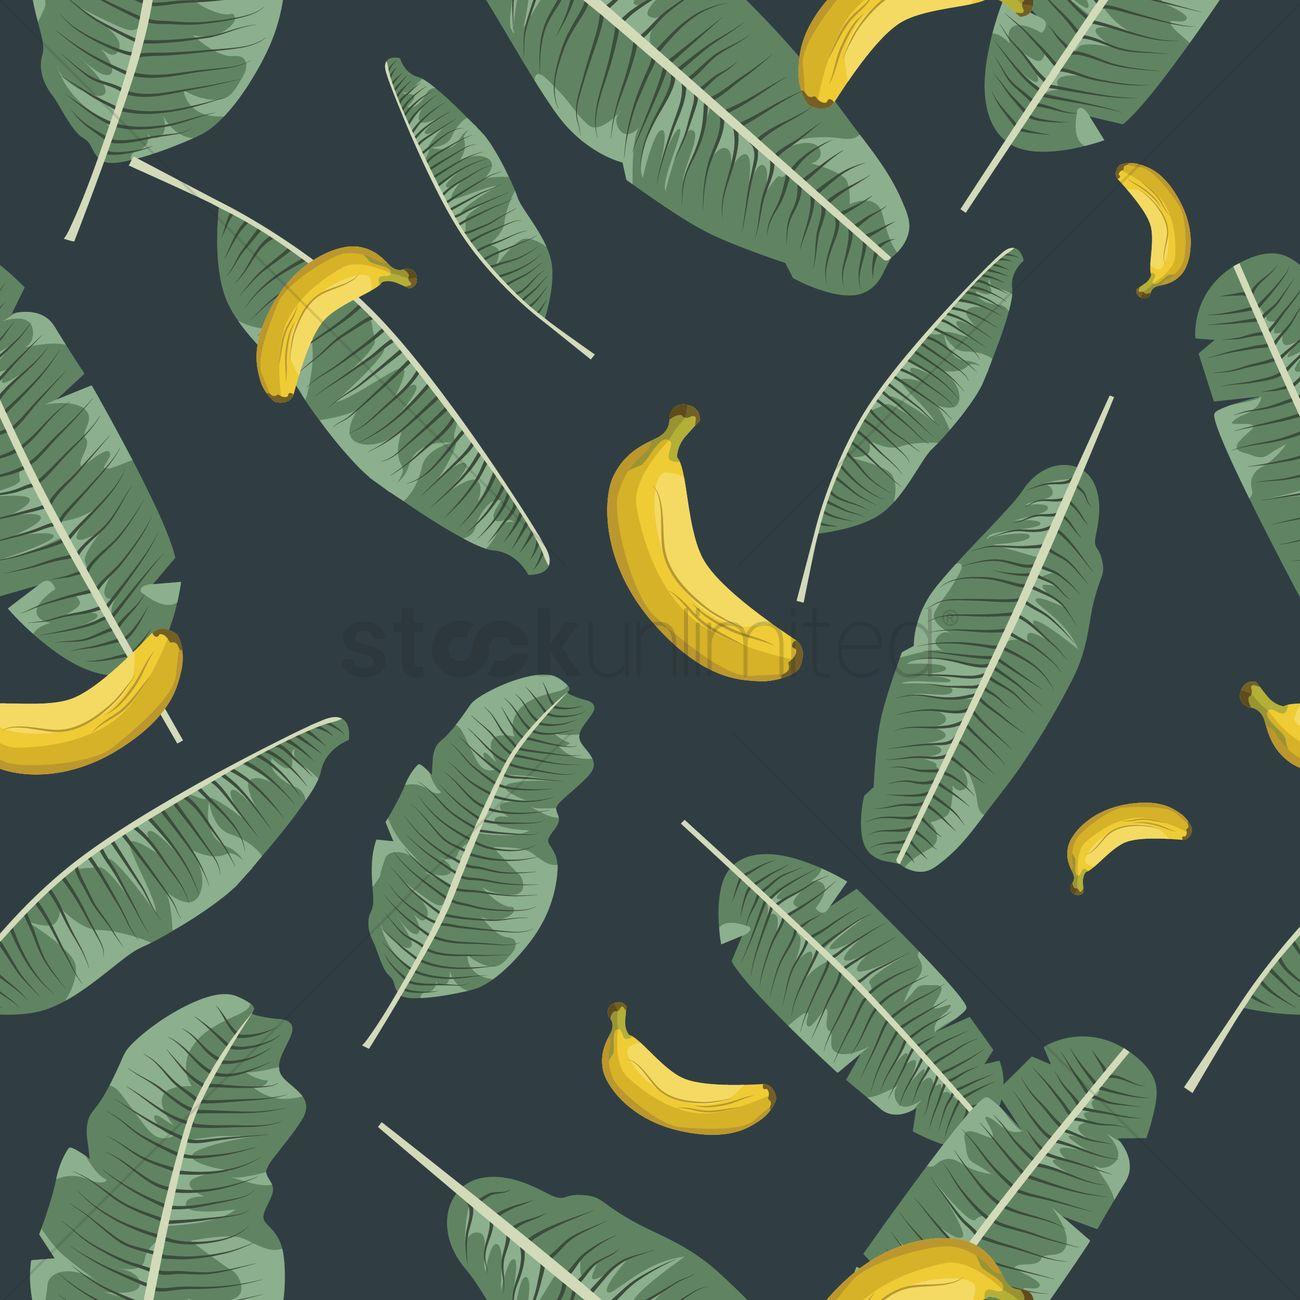 Banana background Vector Image - 1818171 | StockUnlimited